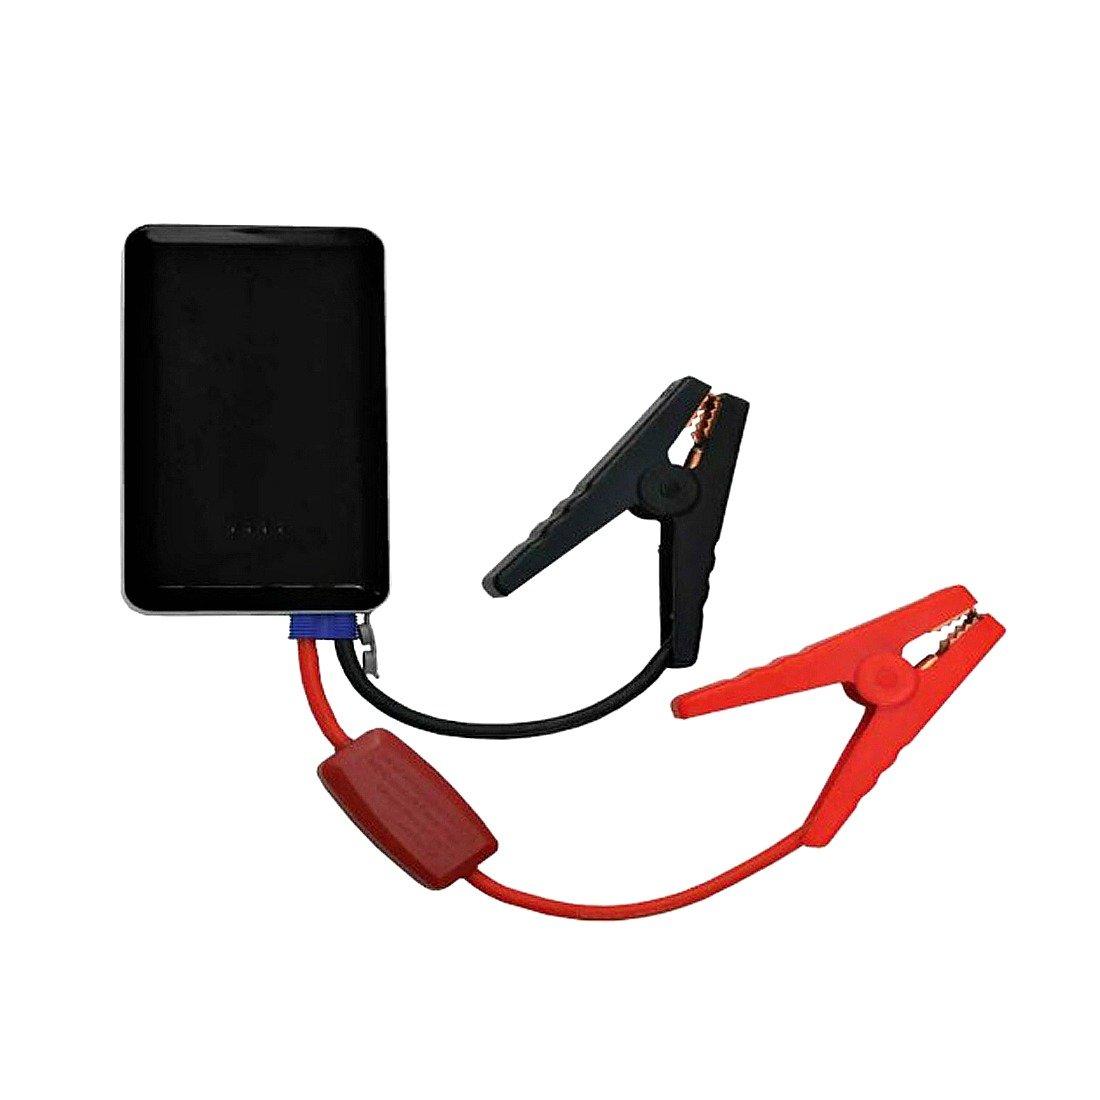 Stinger 6000 mAh Portable Jump Starter & USB Digital Device Power Pack 12V by STINGER Jump Starter & Power Pack (Image #1)